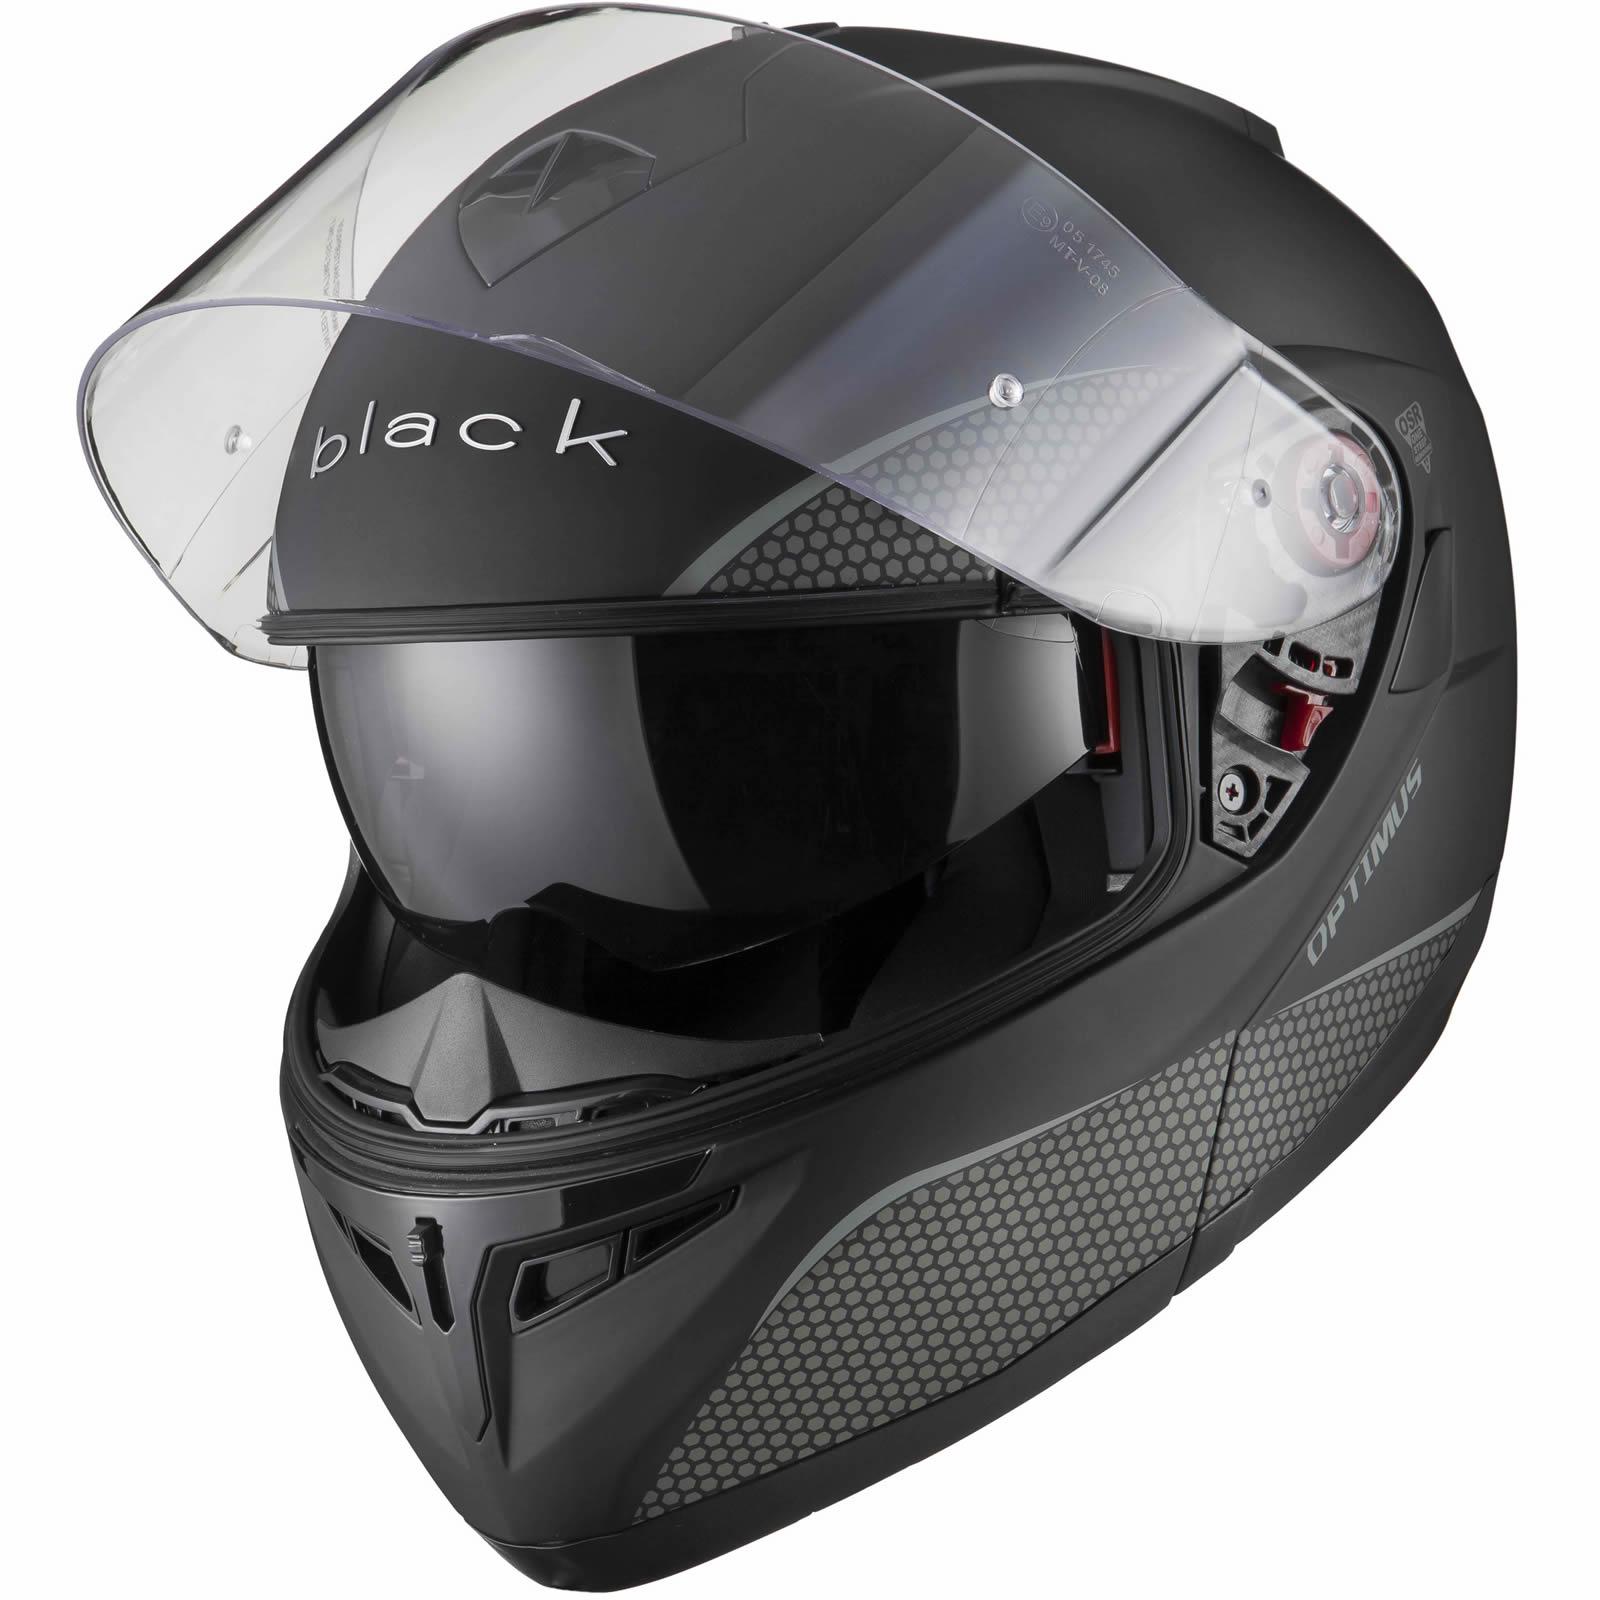 Black-Optimus-SV-Max-Vision-Flip-Up-Front-Motorcycle-Helmet-Pinlock-Ready-Visor thumbnail 20